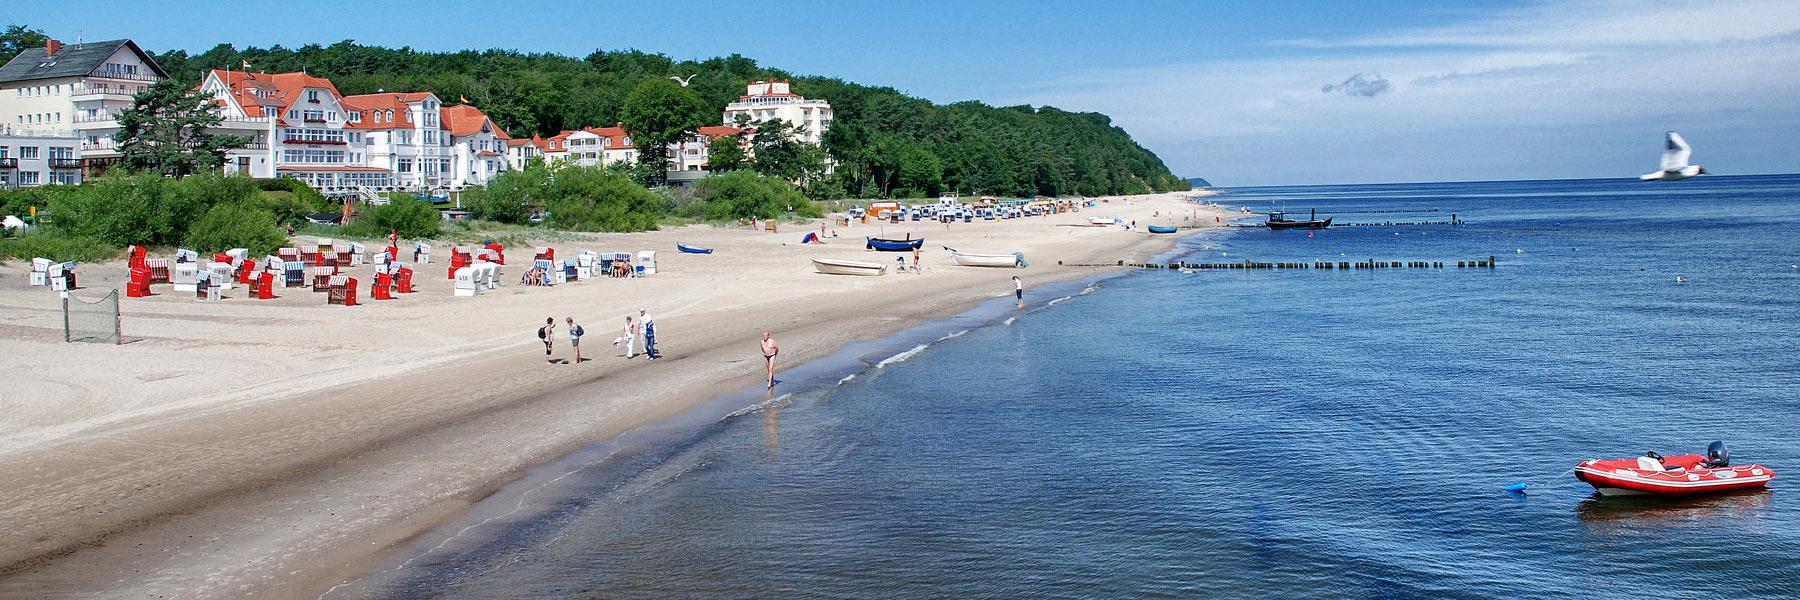 Strand - Seeheilbad Bansin